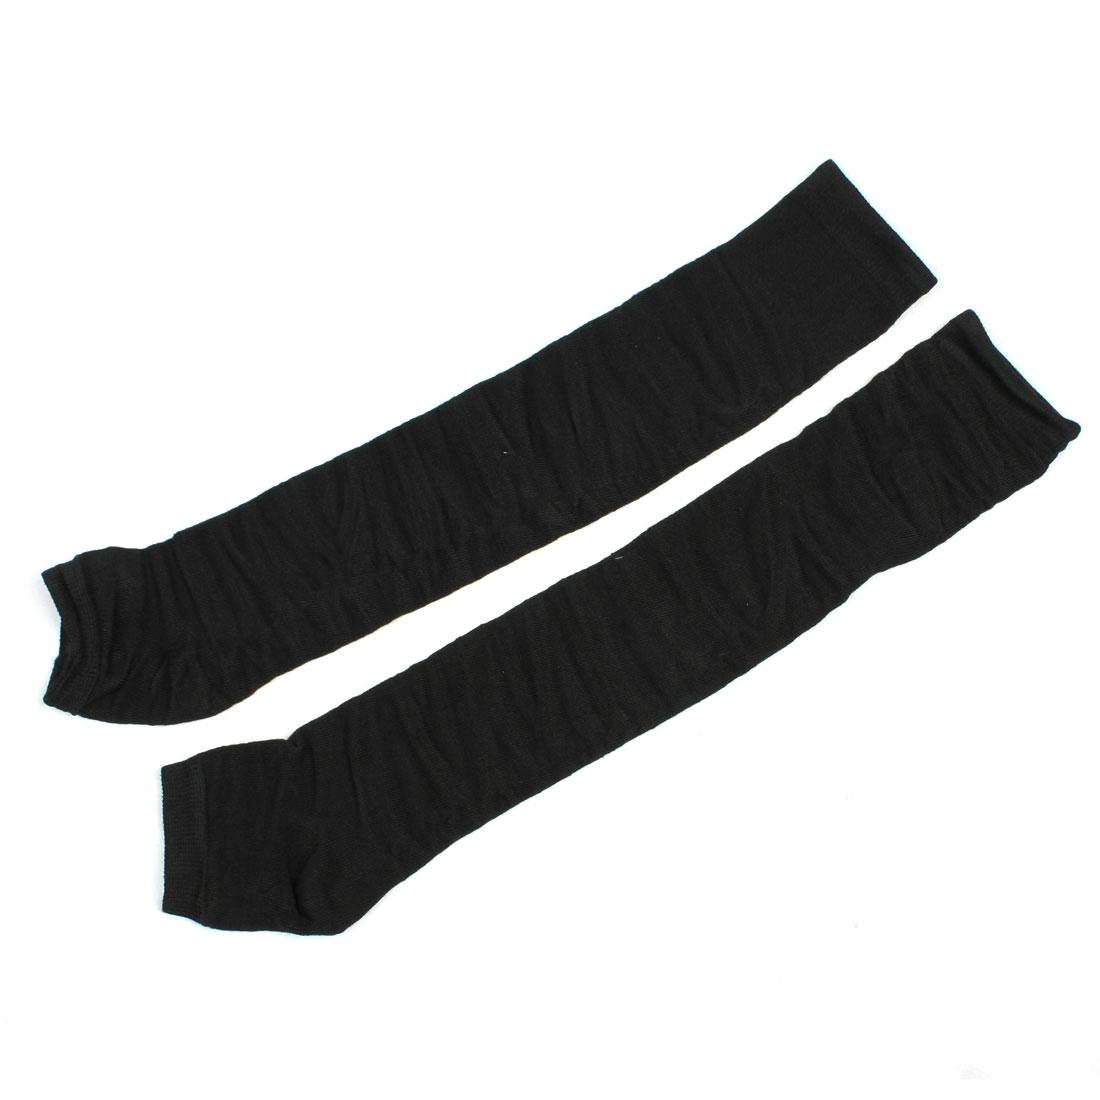 Winter Black Elastic Knitting Wrinkled Leg Warmer Pair for Lady Woman